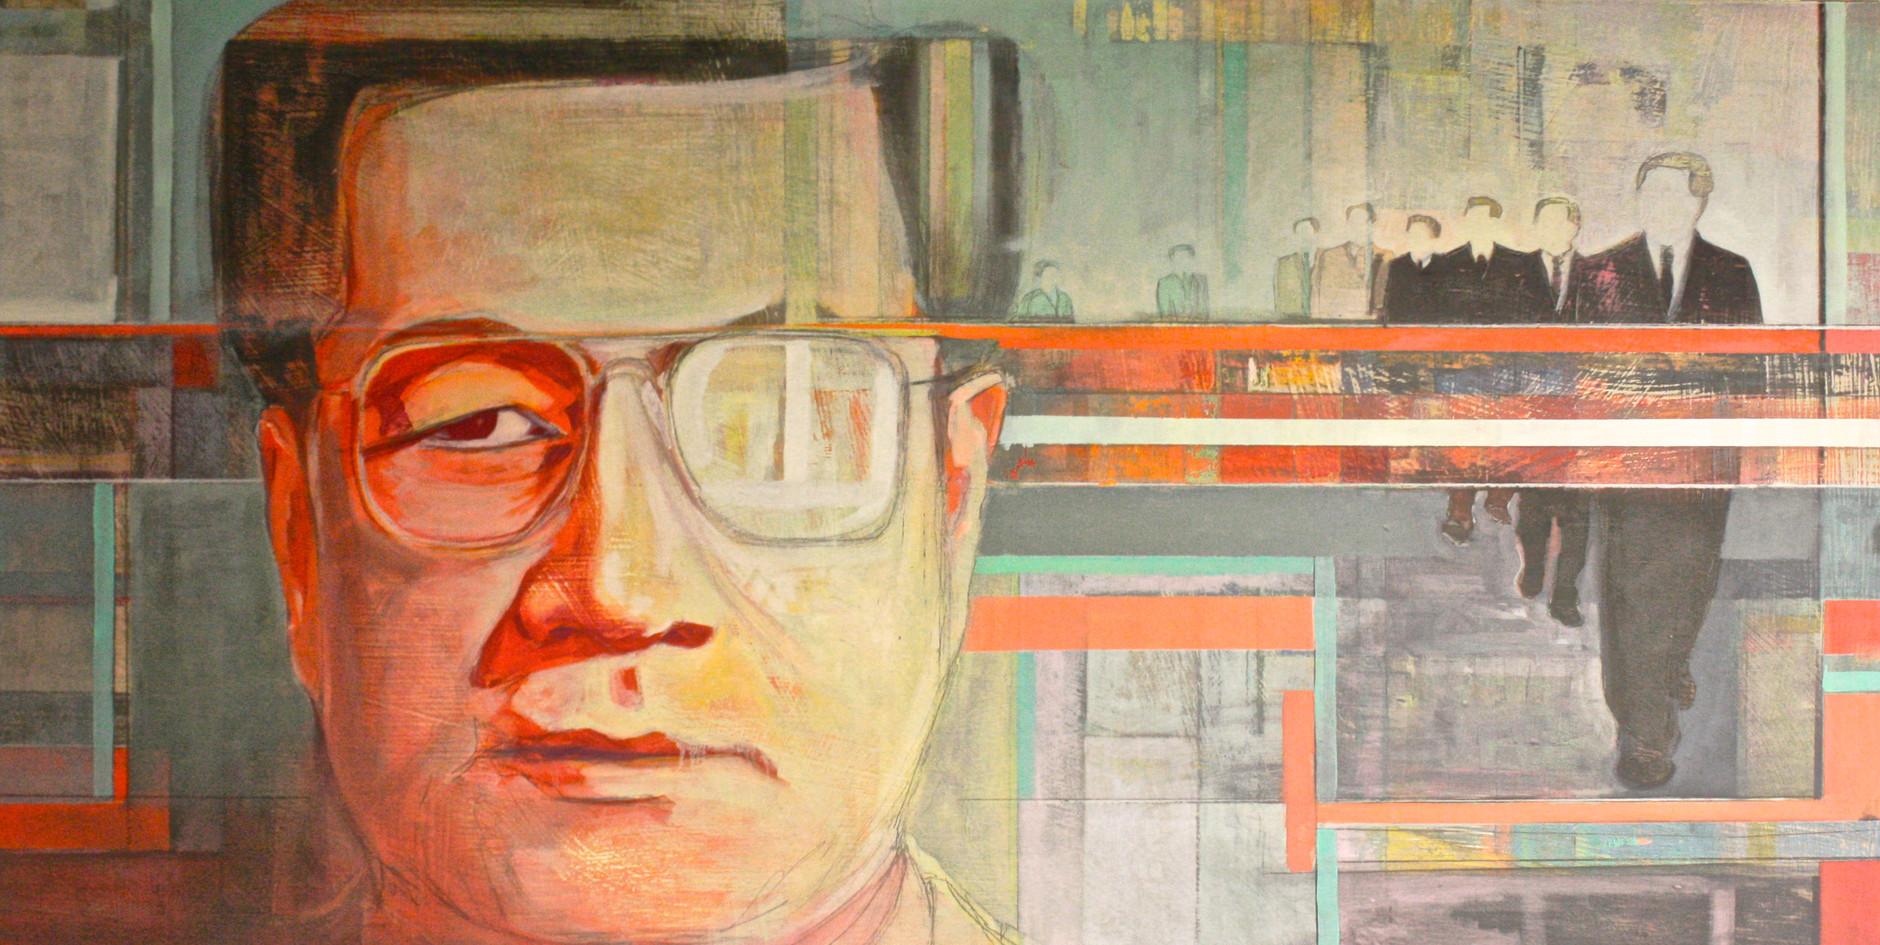 Hu Jin Tao